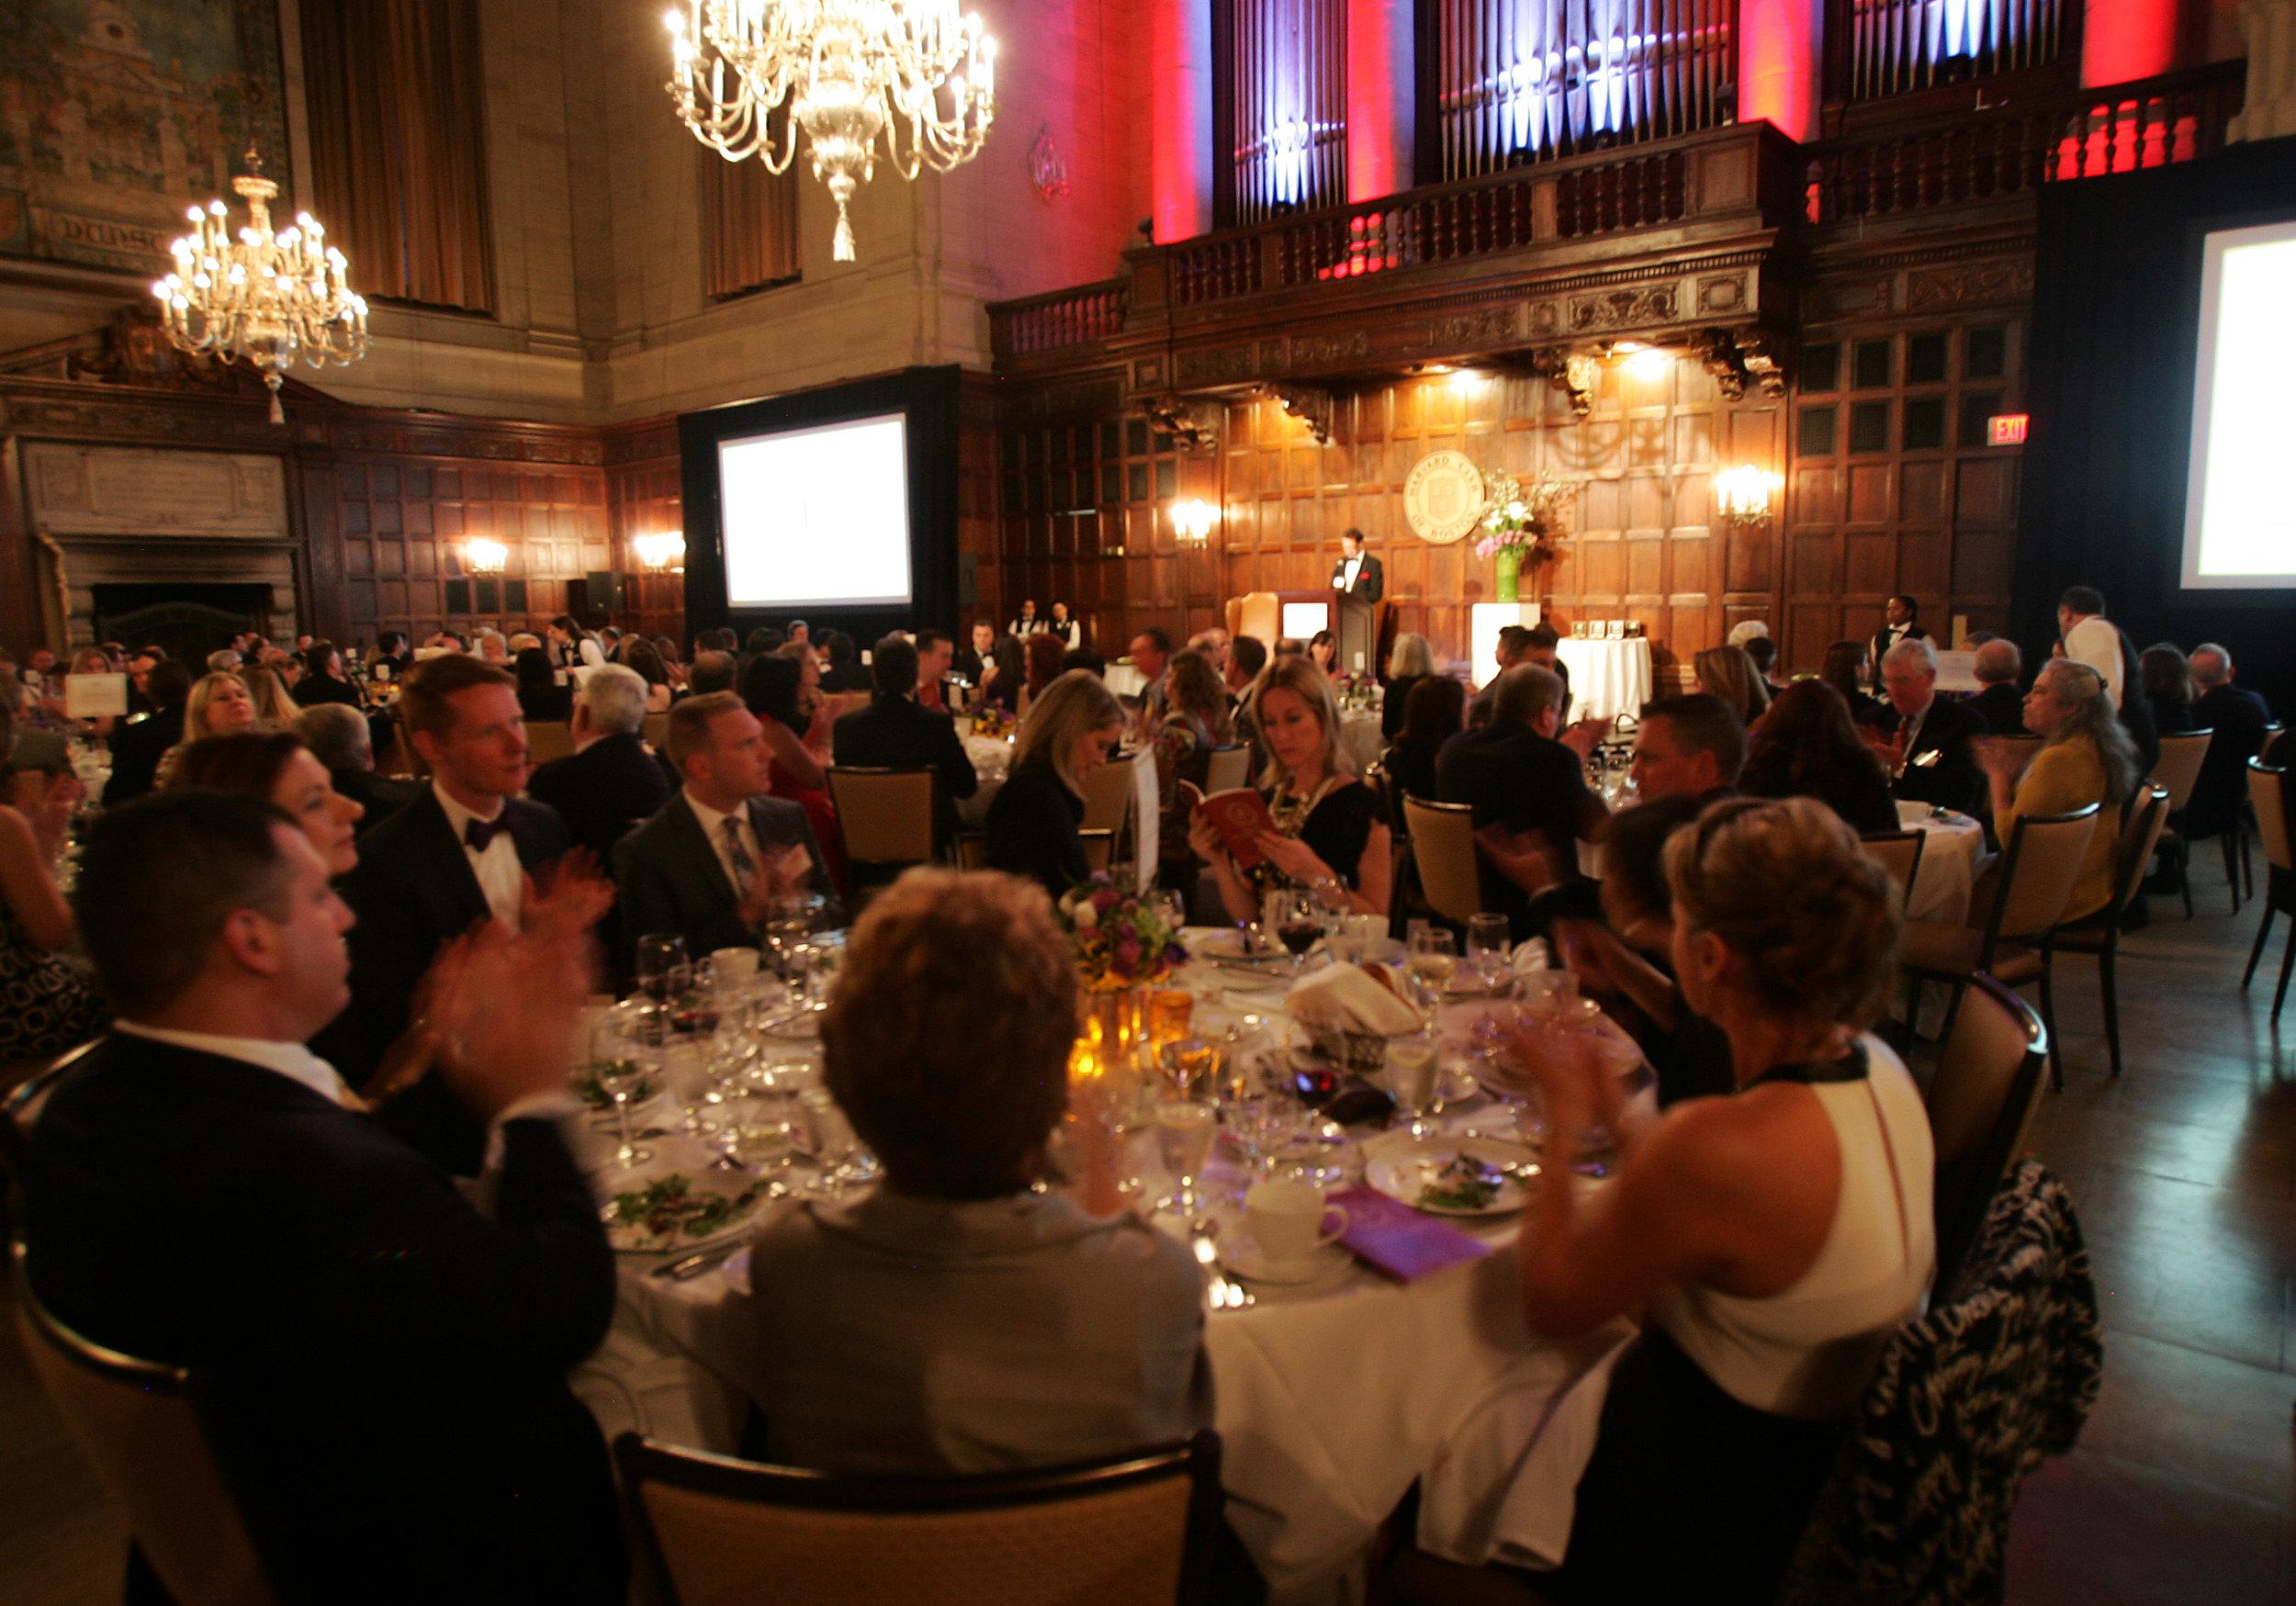 Awards gala underway in Harvard Hall